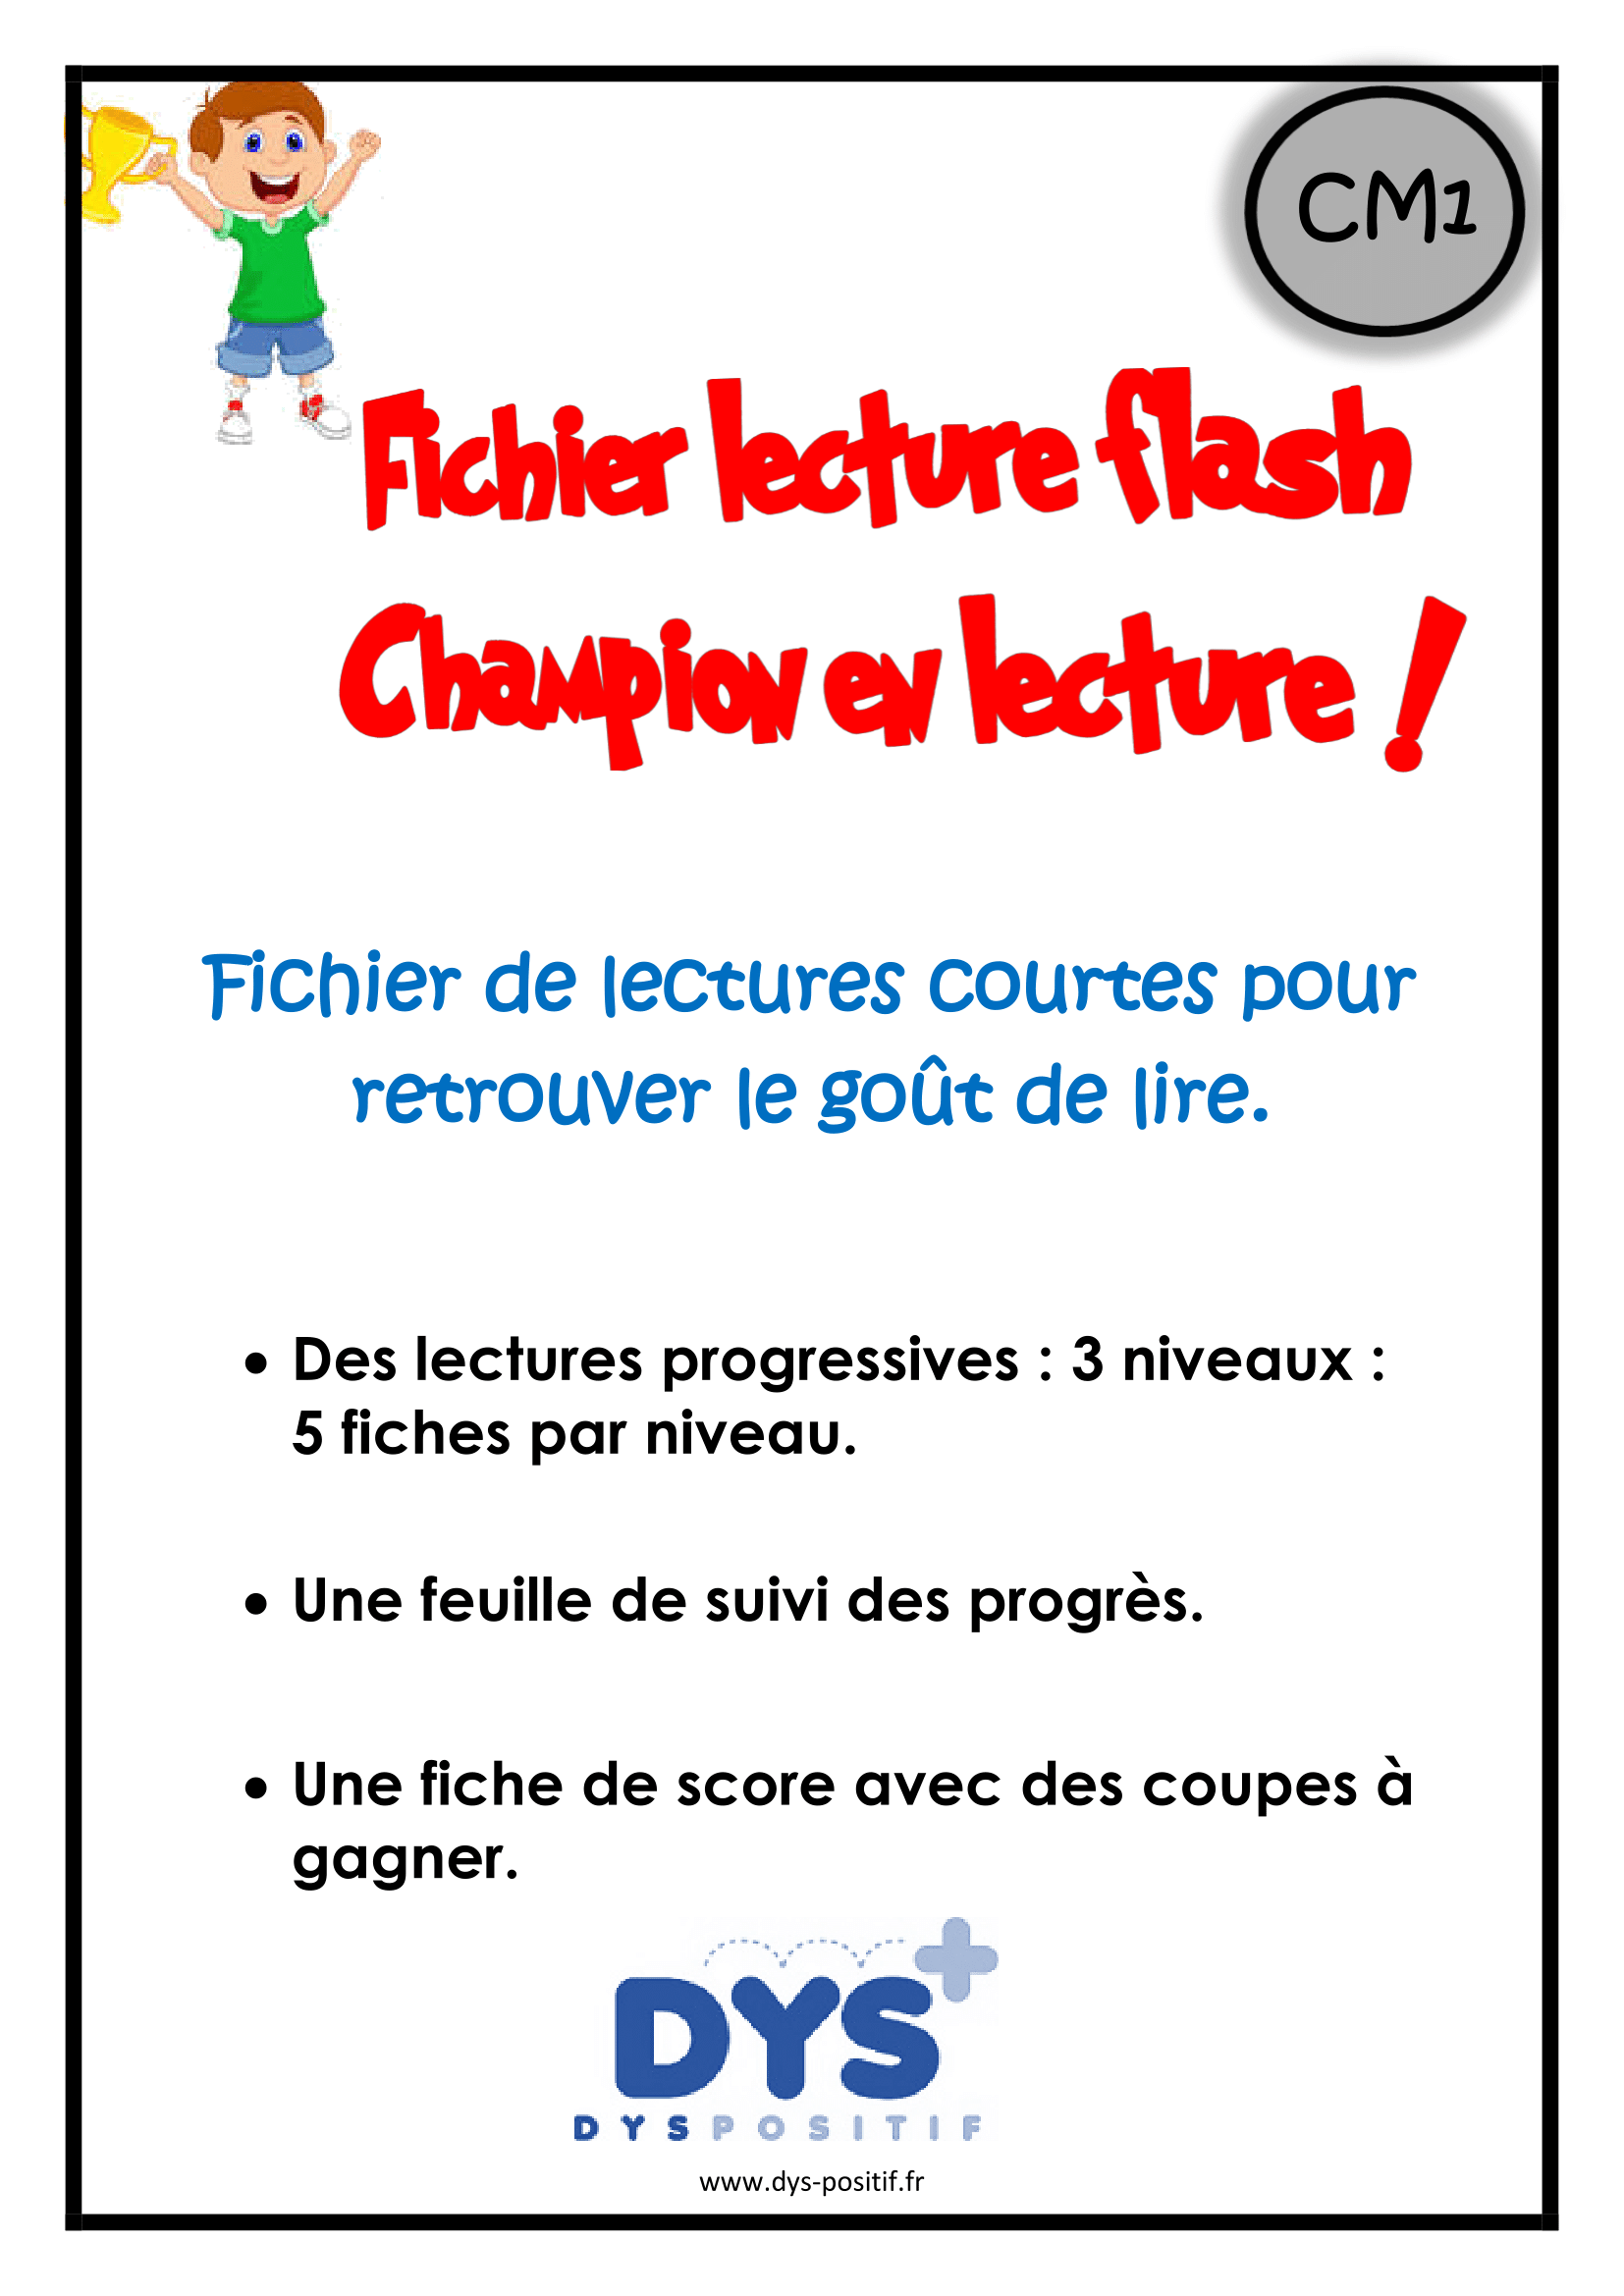 Lecture flash CM1